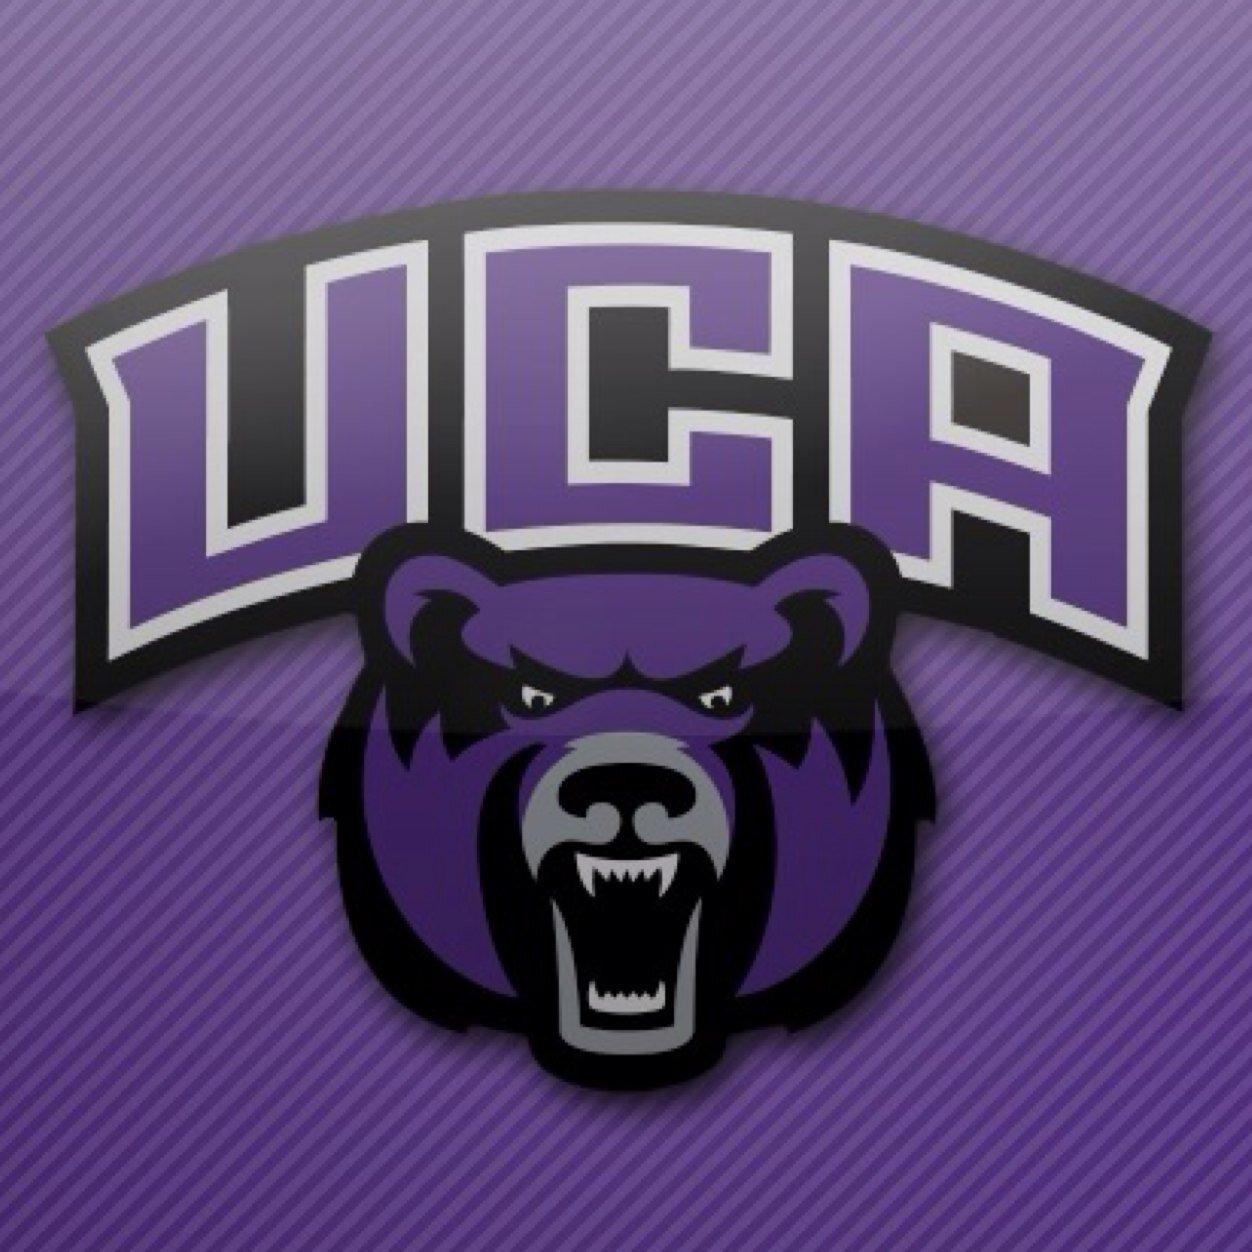 UCA Bears logo